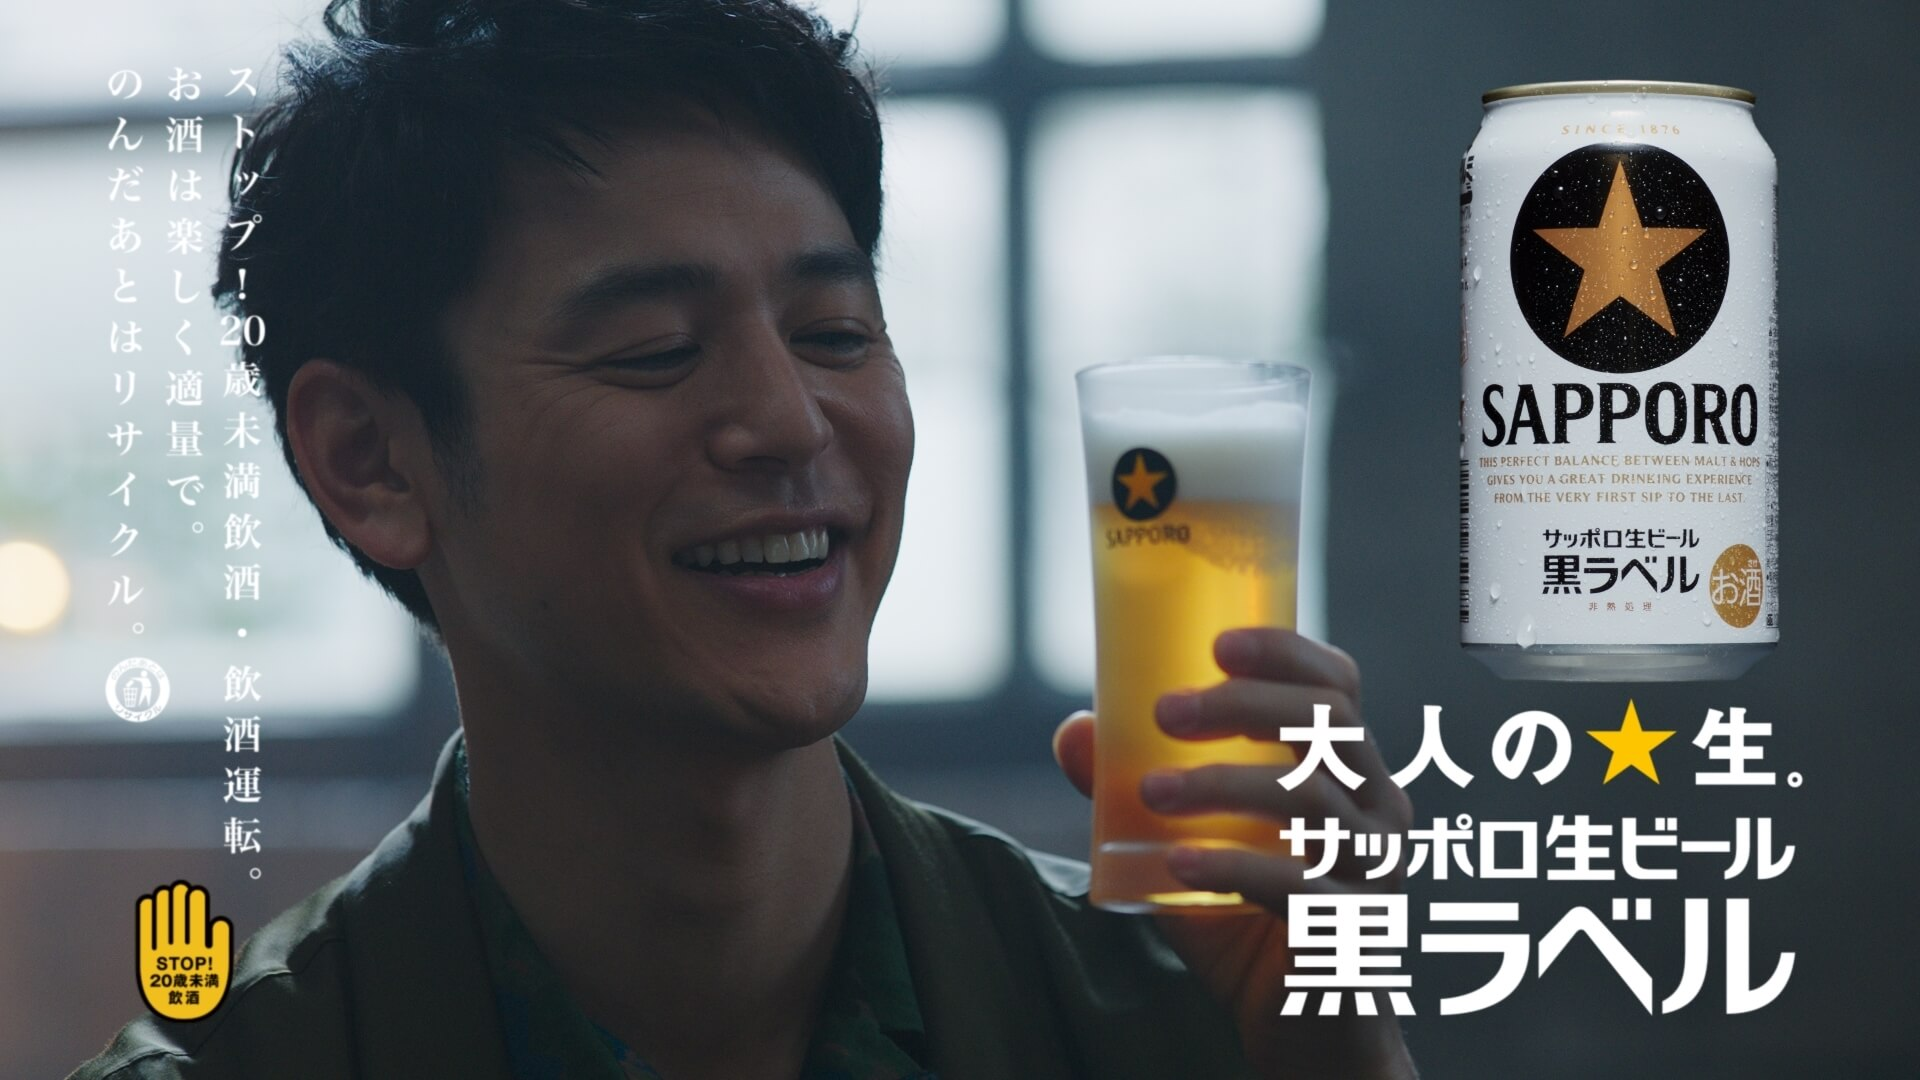 King Gnu常田大希が語る大人とは?サッポロ生ビール黒ラベルのCM「大人エレベーター」に登場! gourmet200327_sapporo_tsuneda_12